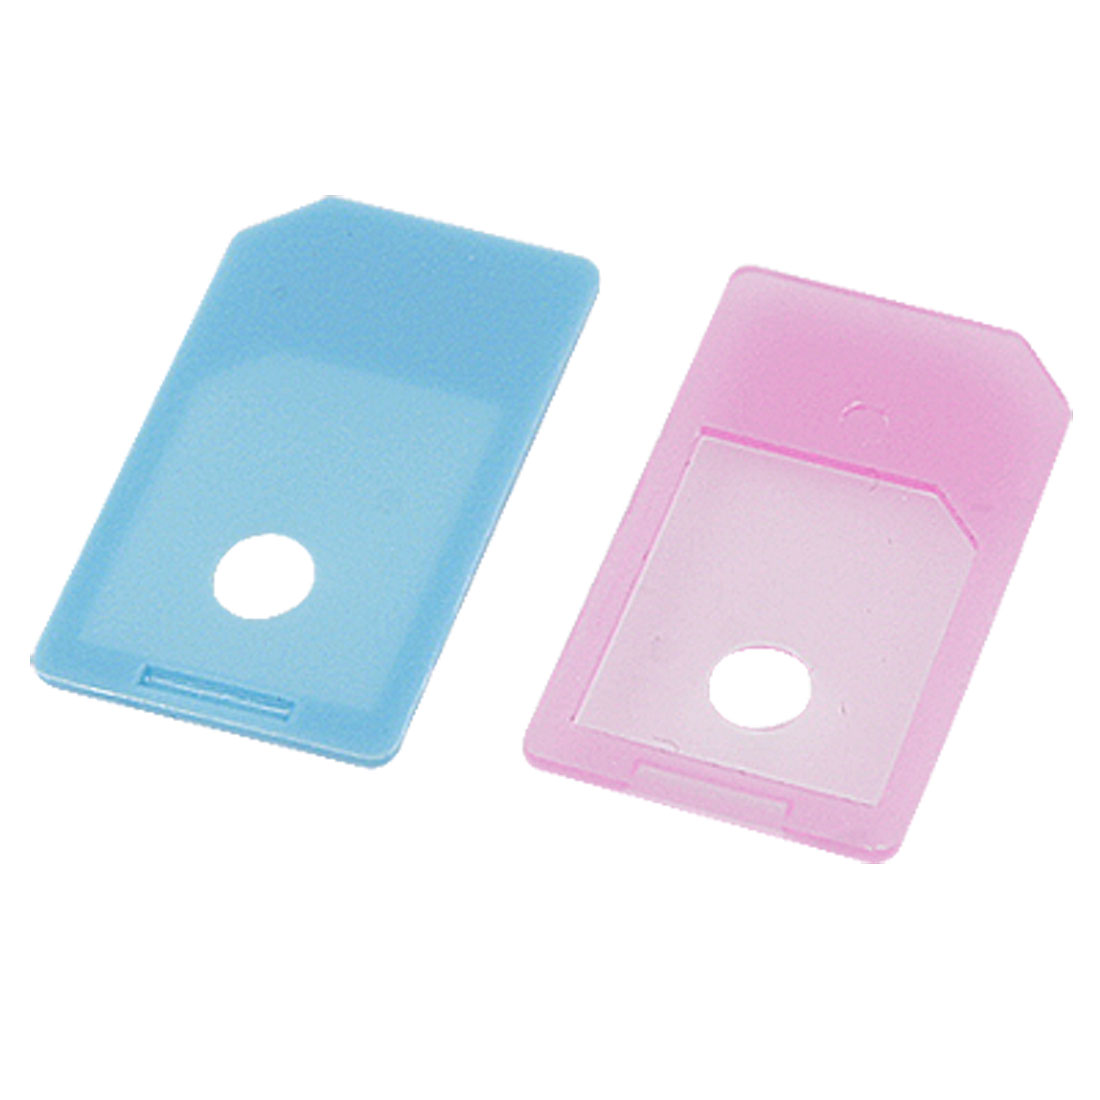 2 Pcs Micro SIM to SIM Card Adapter